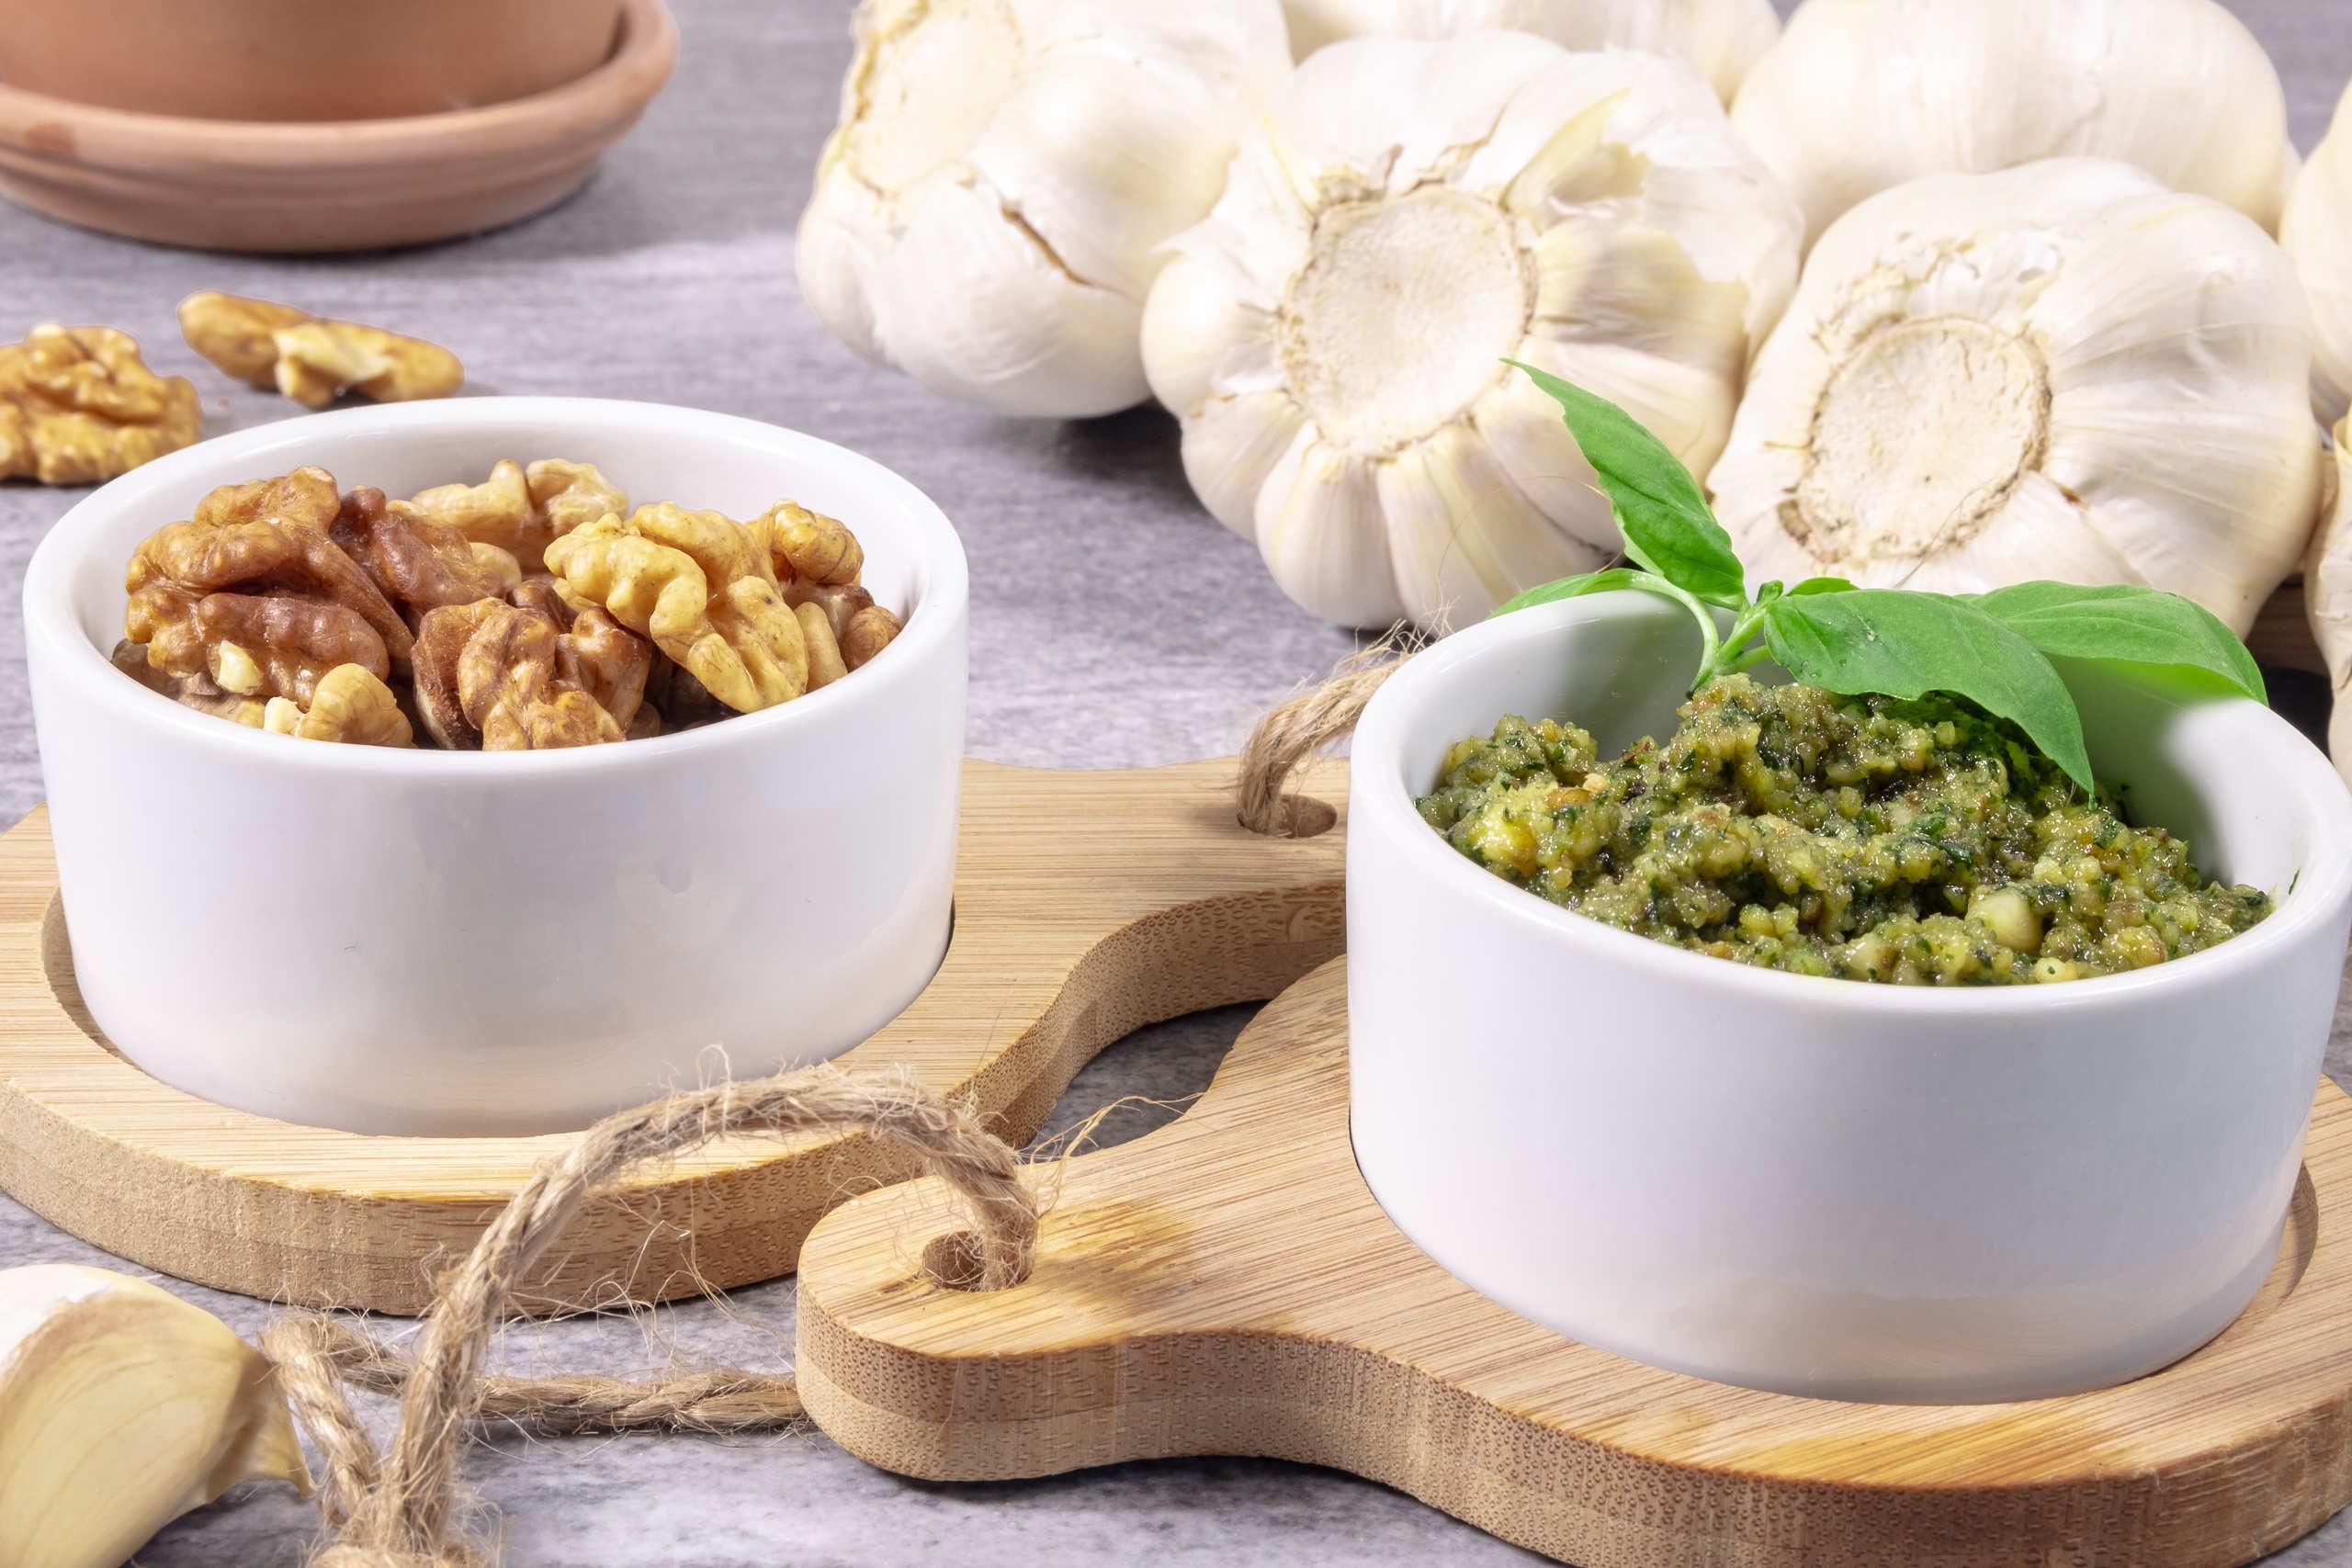 Recept vegansk gnocchi